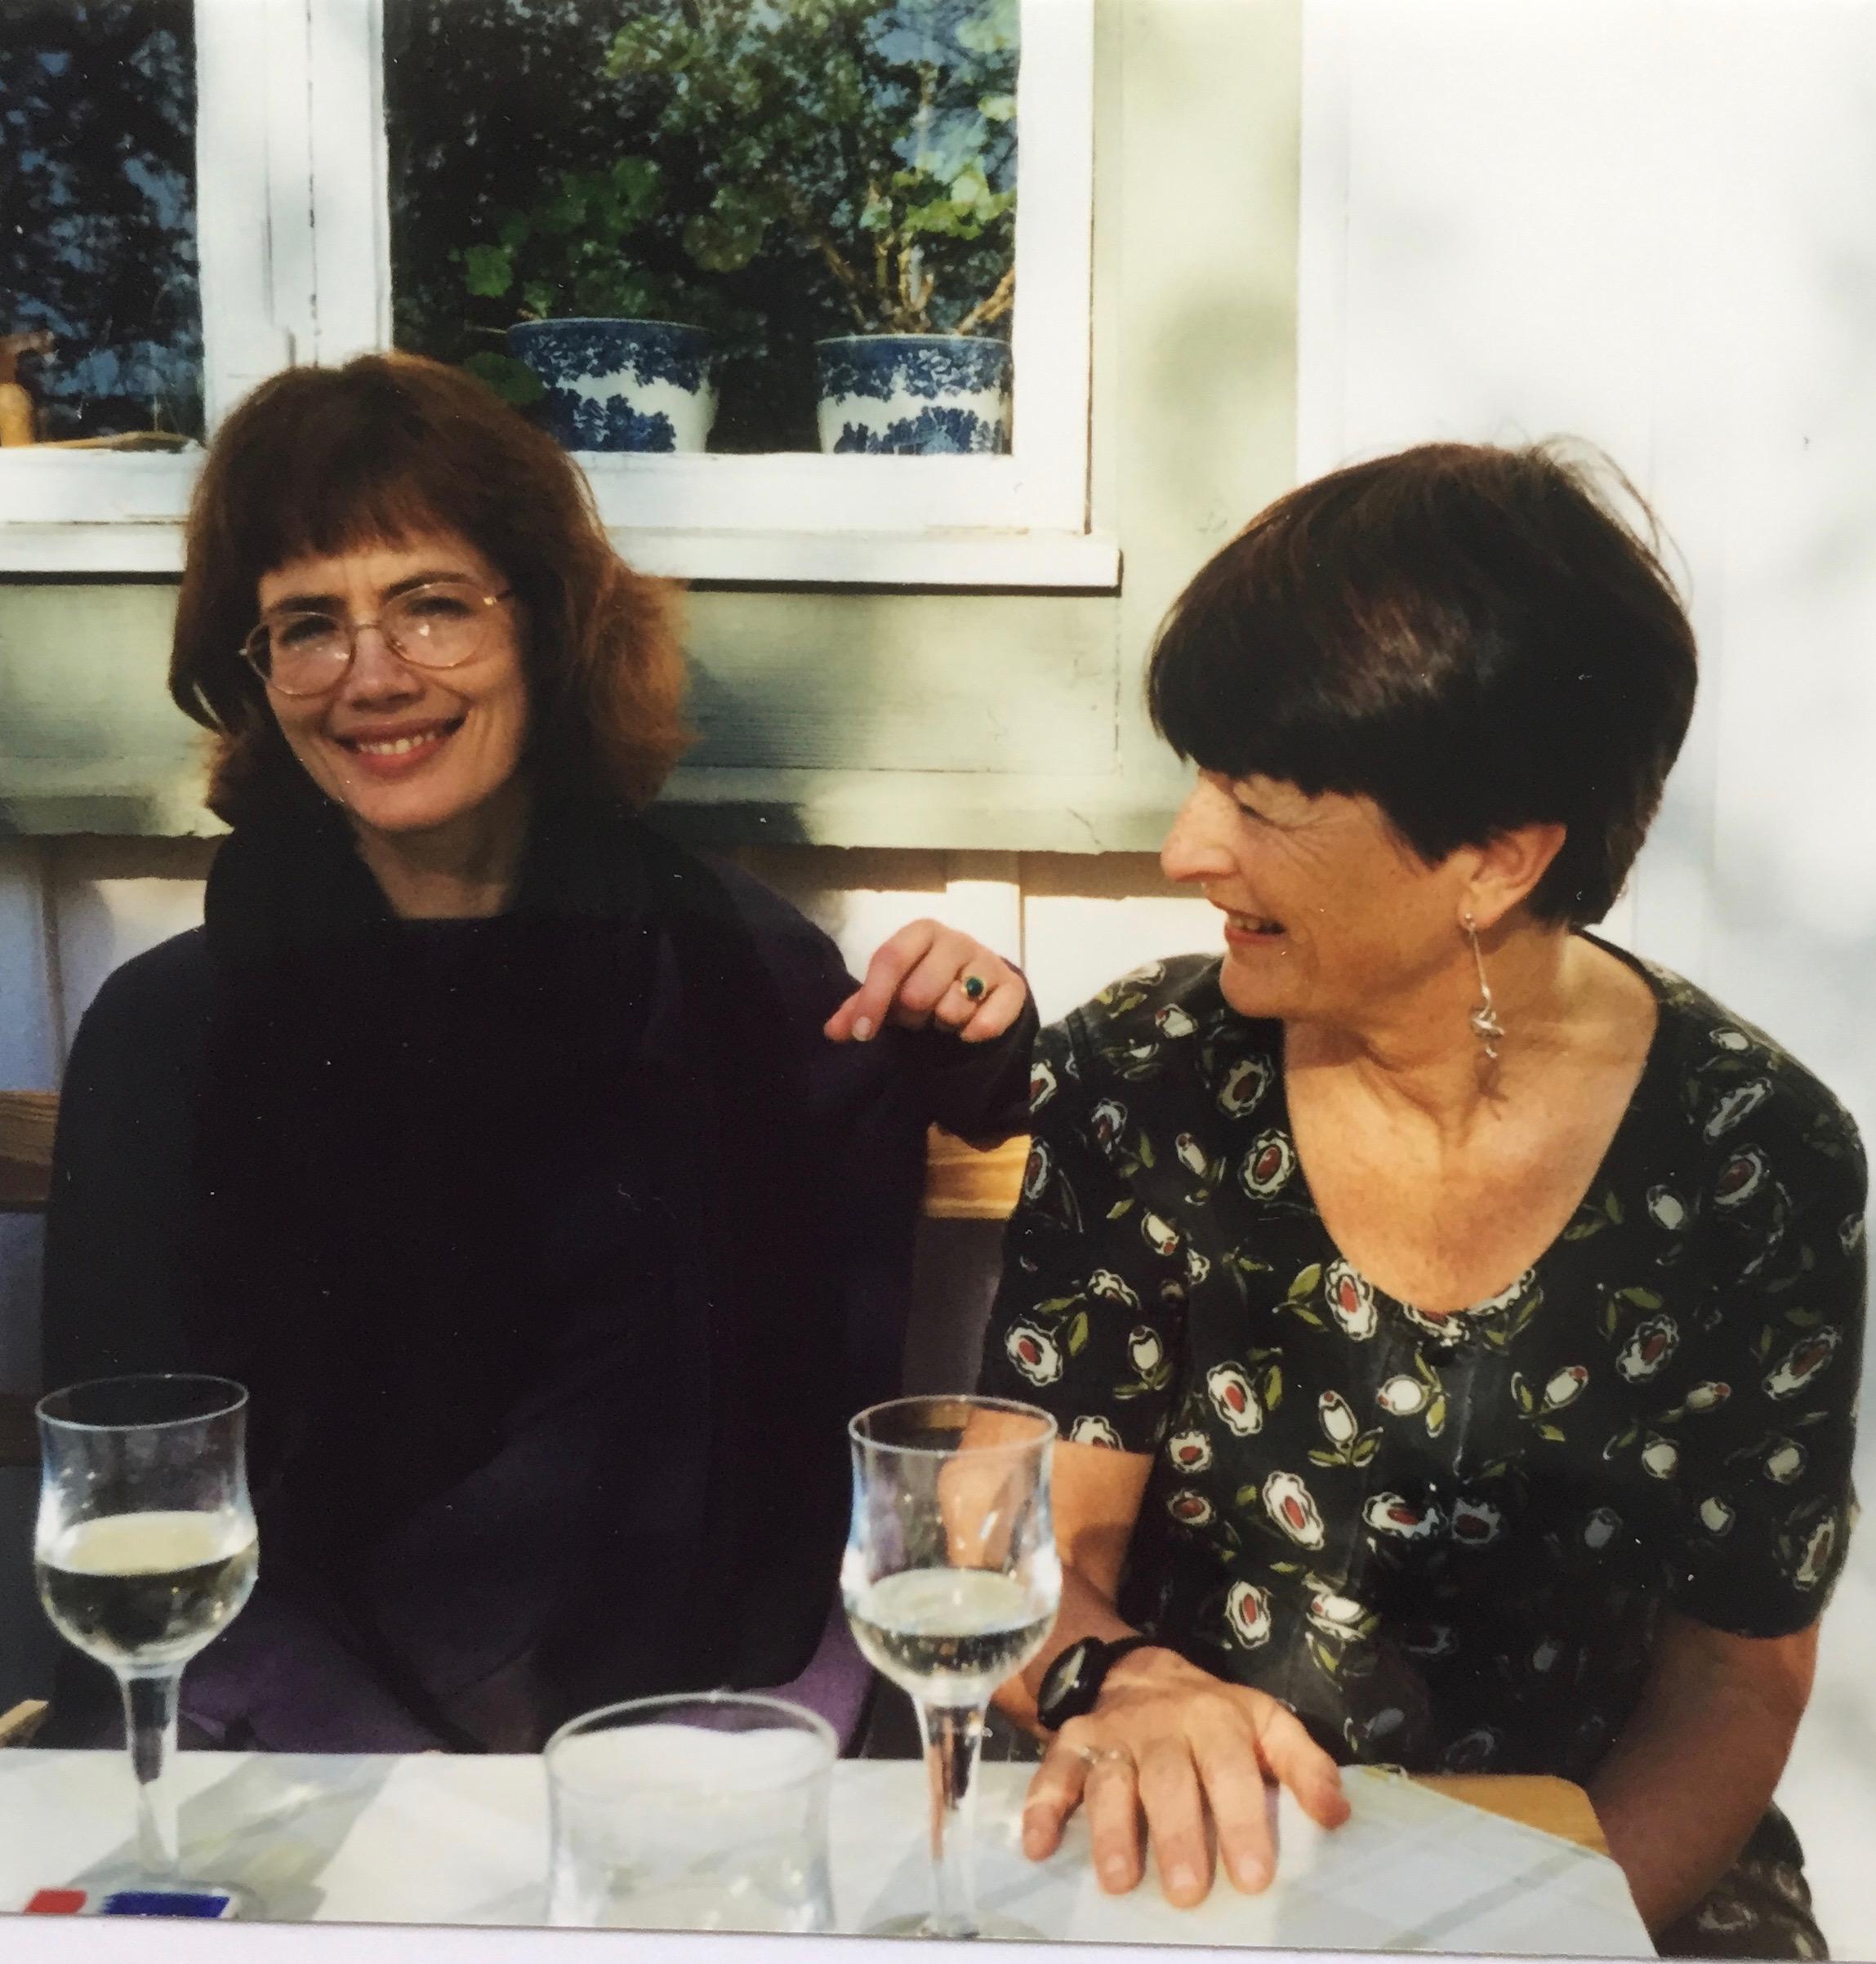 Marika Lagercrantz & Marianne Enge Swartz